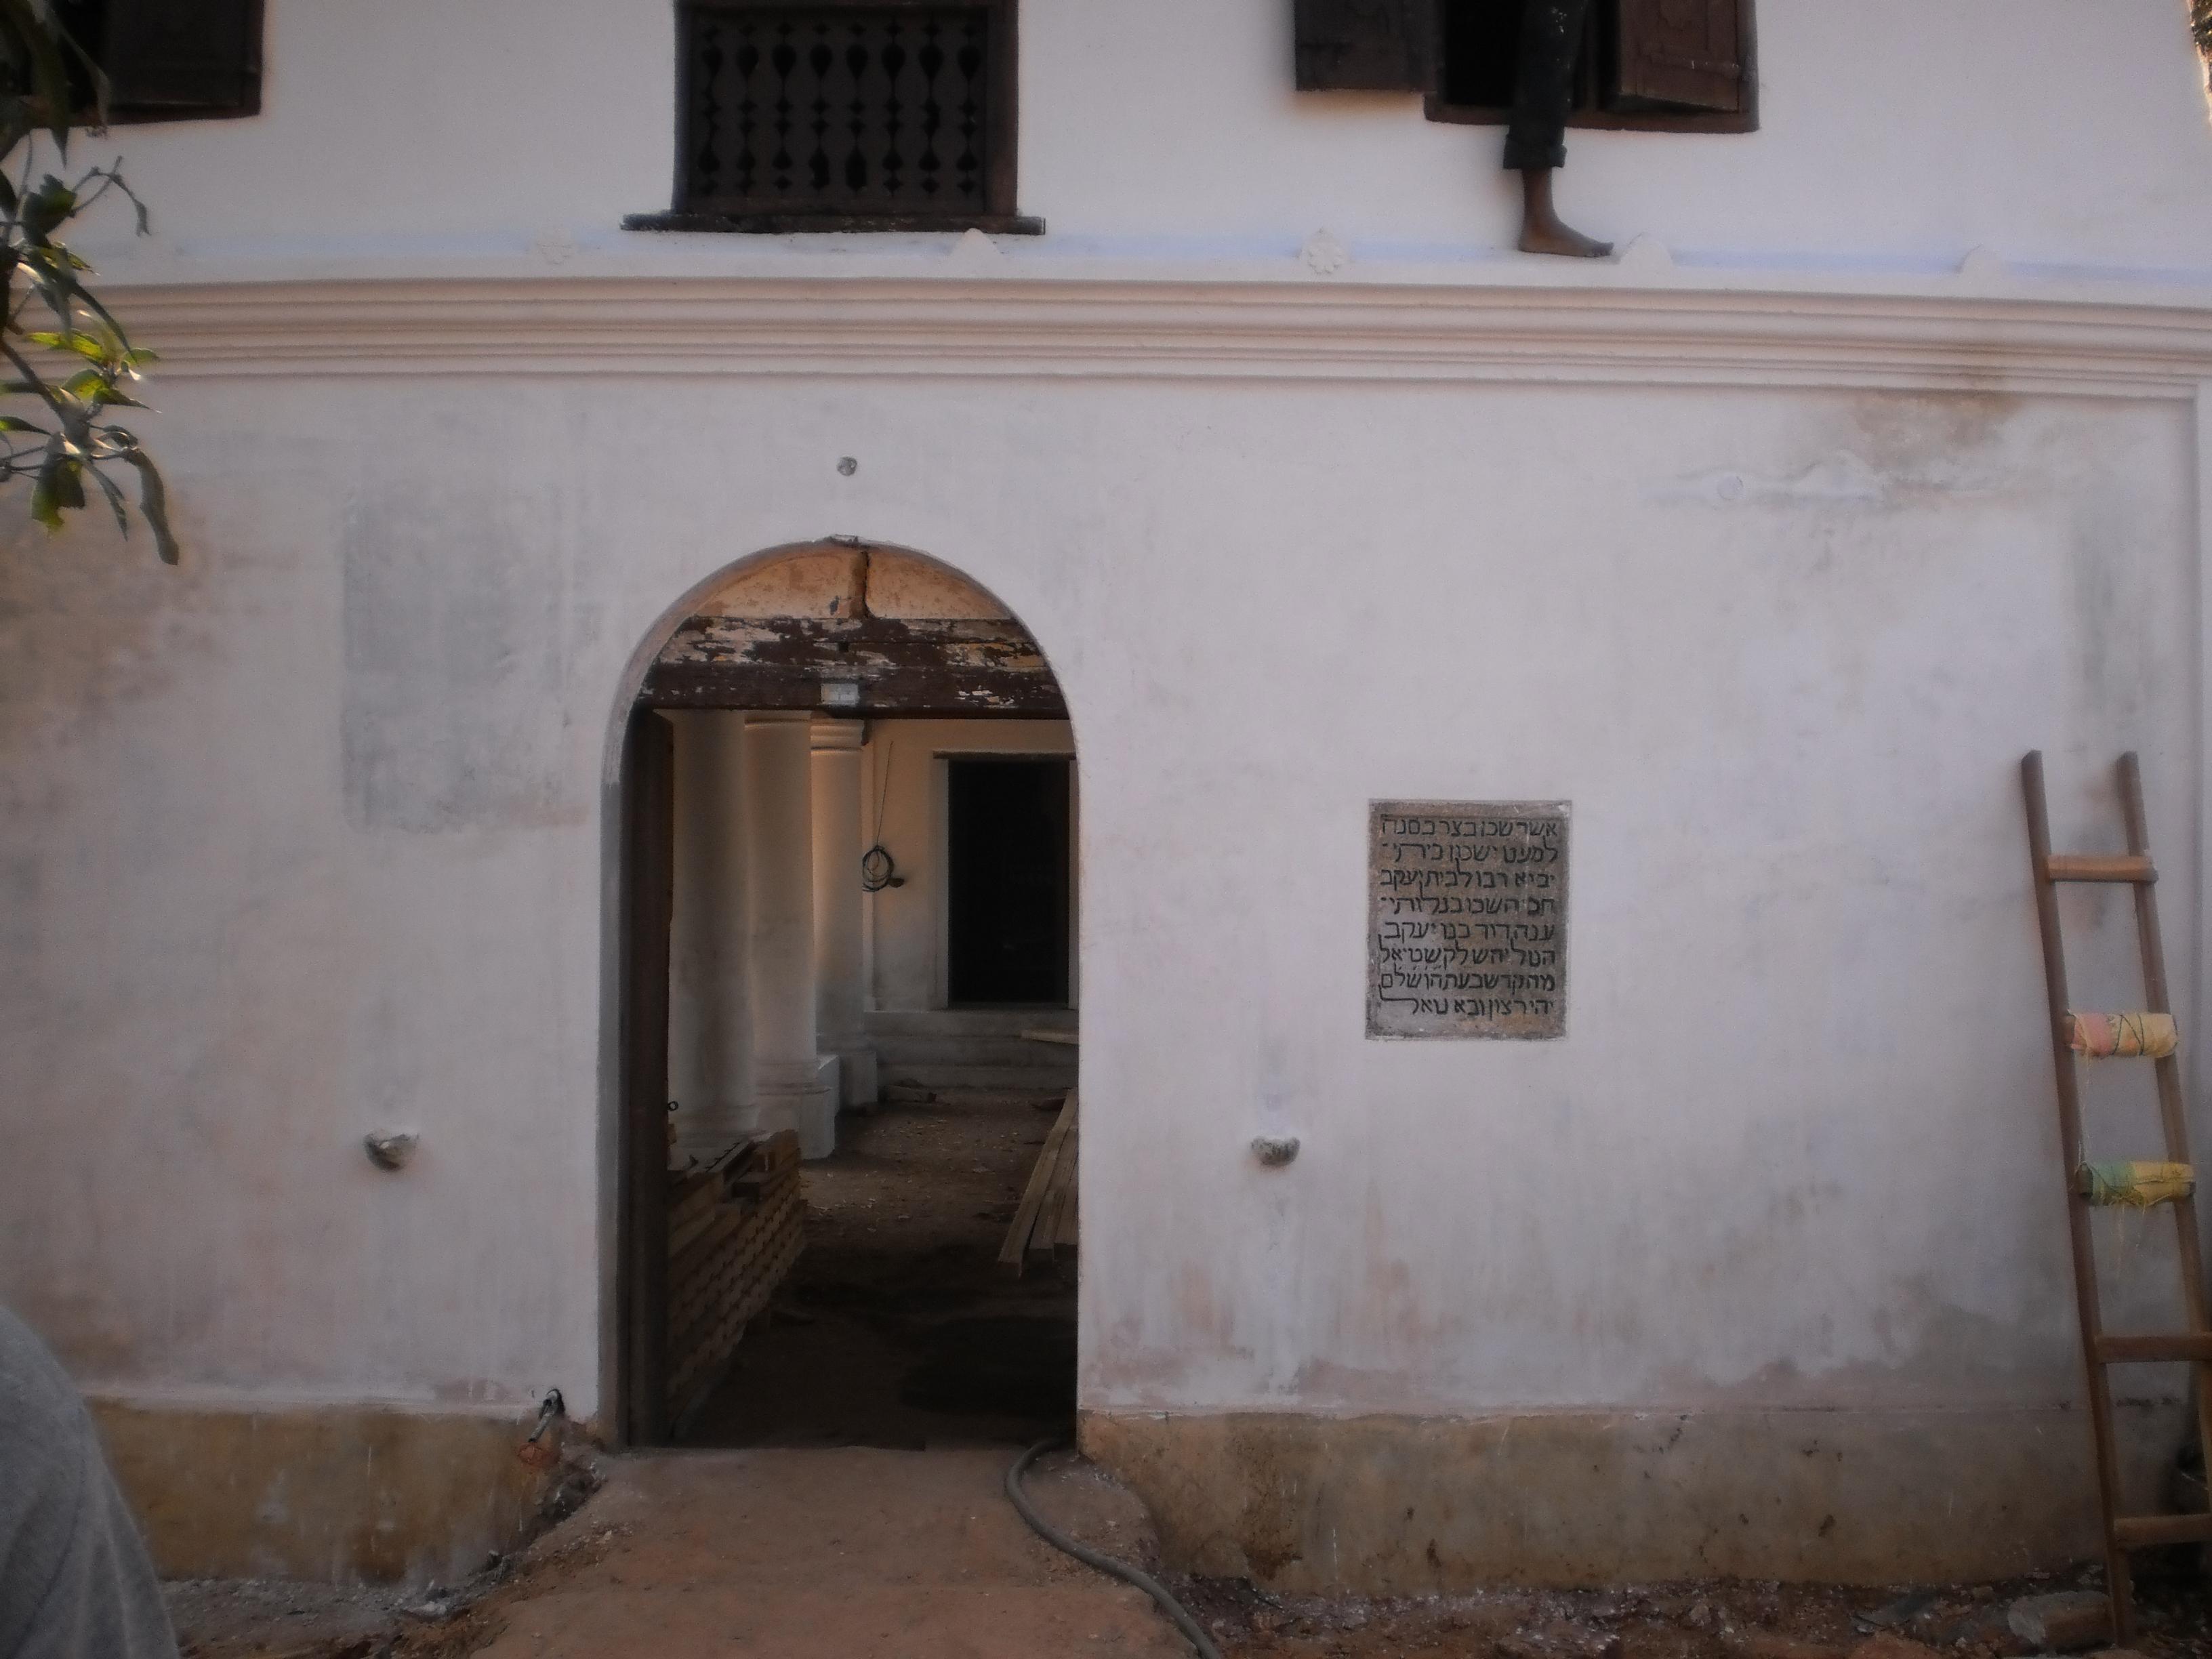 Paravur Synagogue Museum with Inscription on the right side wall during renovation in 2011.jpg മലയാളം: പറവൂര് ജുതപ്പള്ളി മുസിരിസ് പൈതൃകപദ്ധതിയുടെ ഭാഗമായി